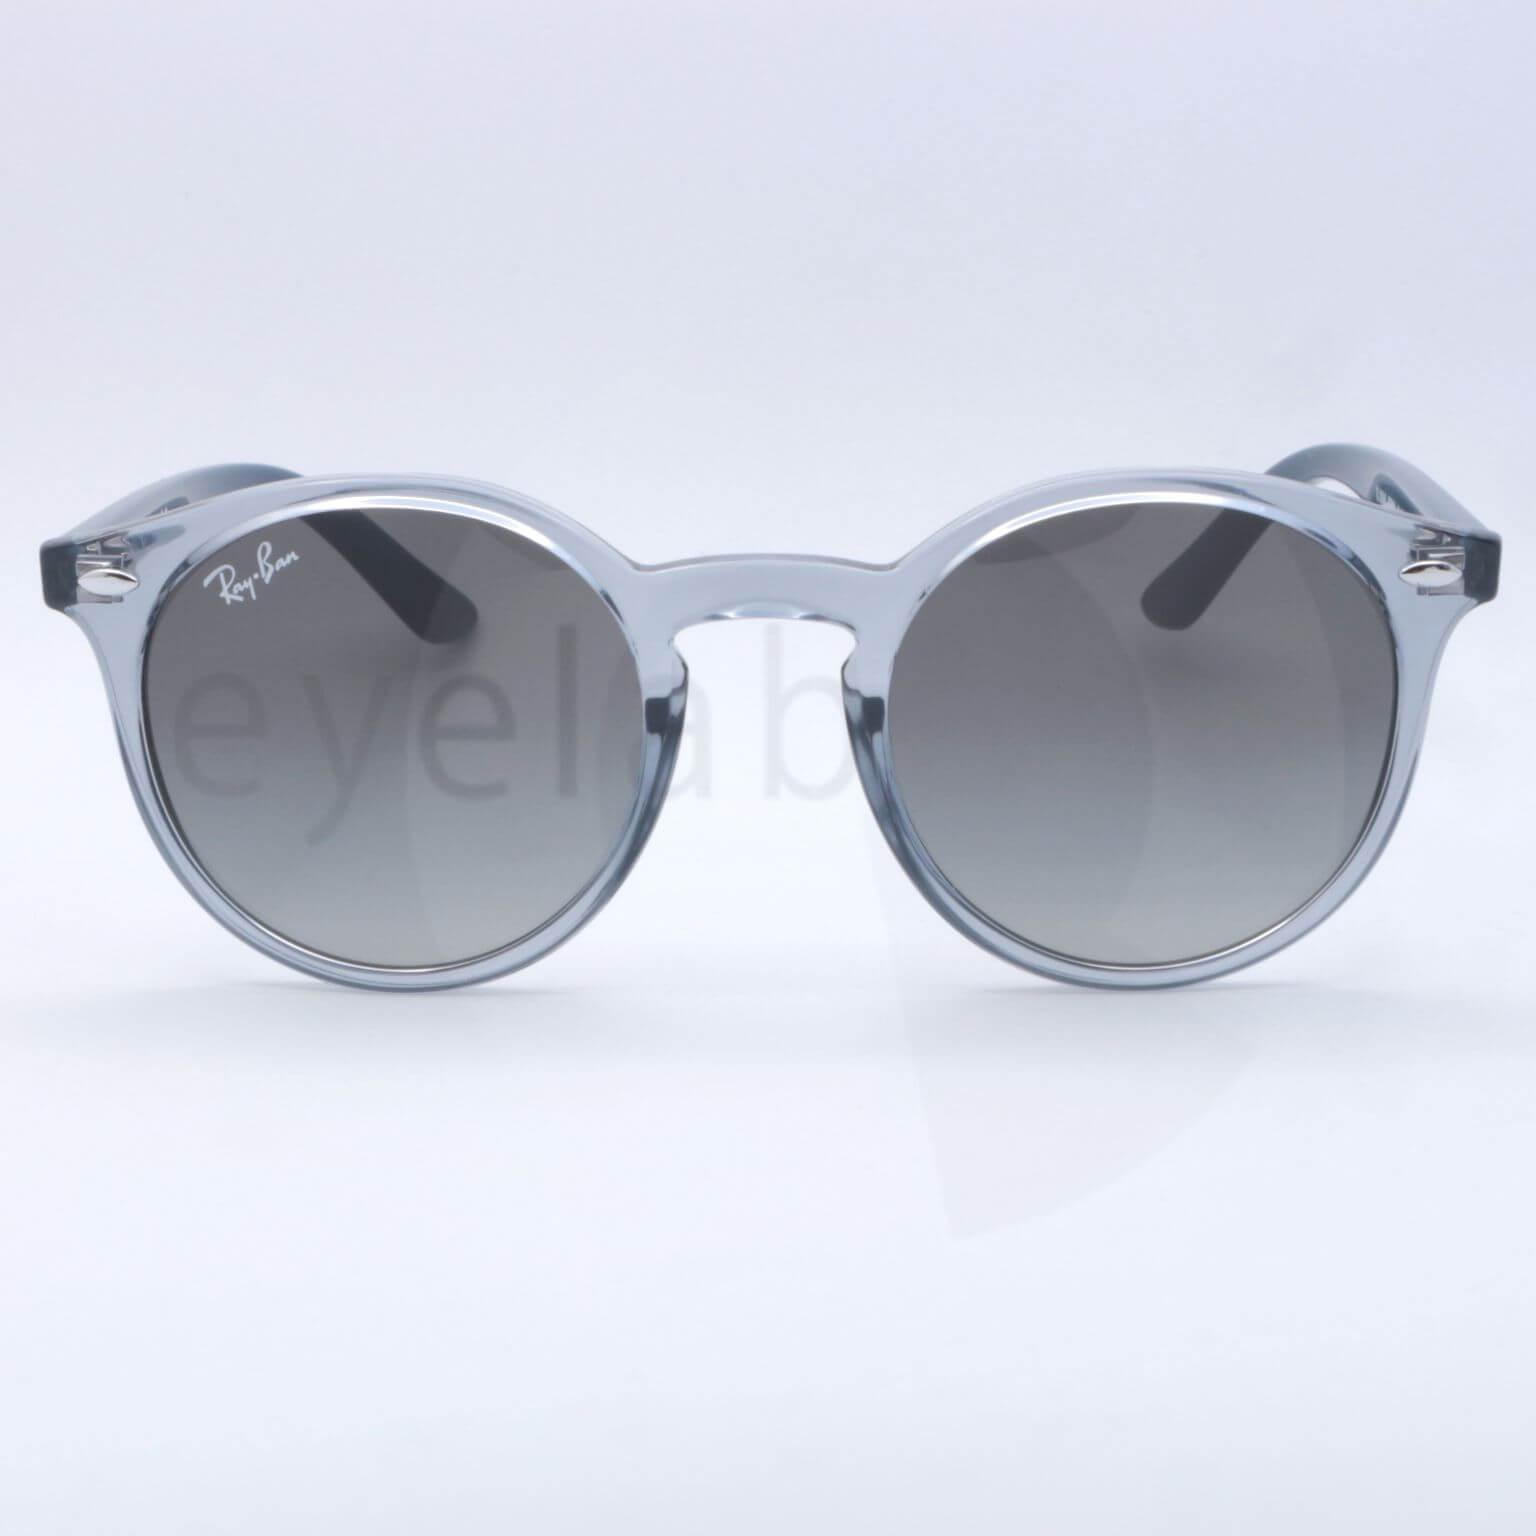 15d19d8b5f Γυαλιά ηλίου Ray-Ban Junior 9064S 705011 44 ~ Eyelab